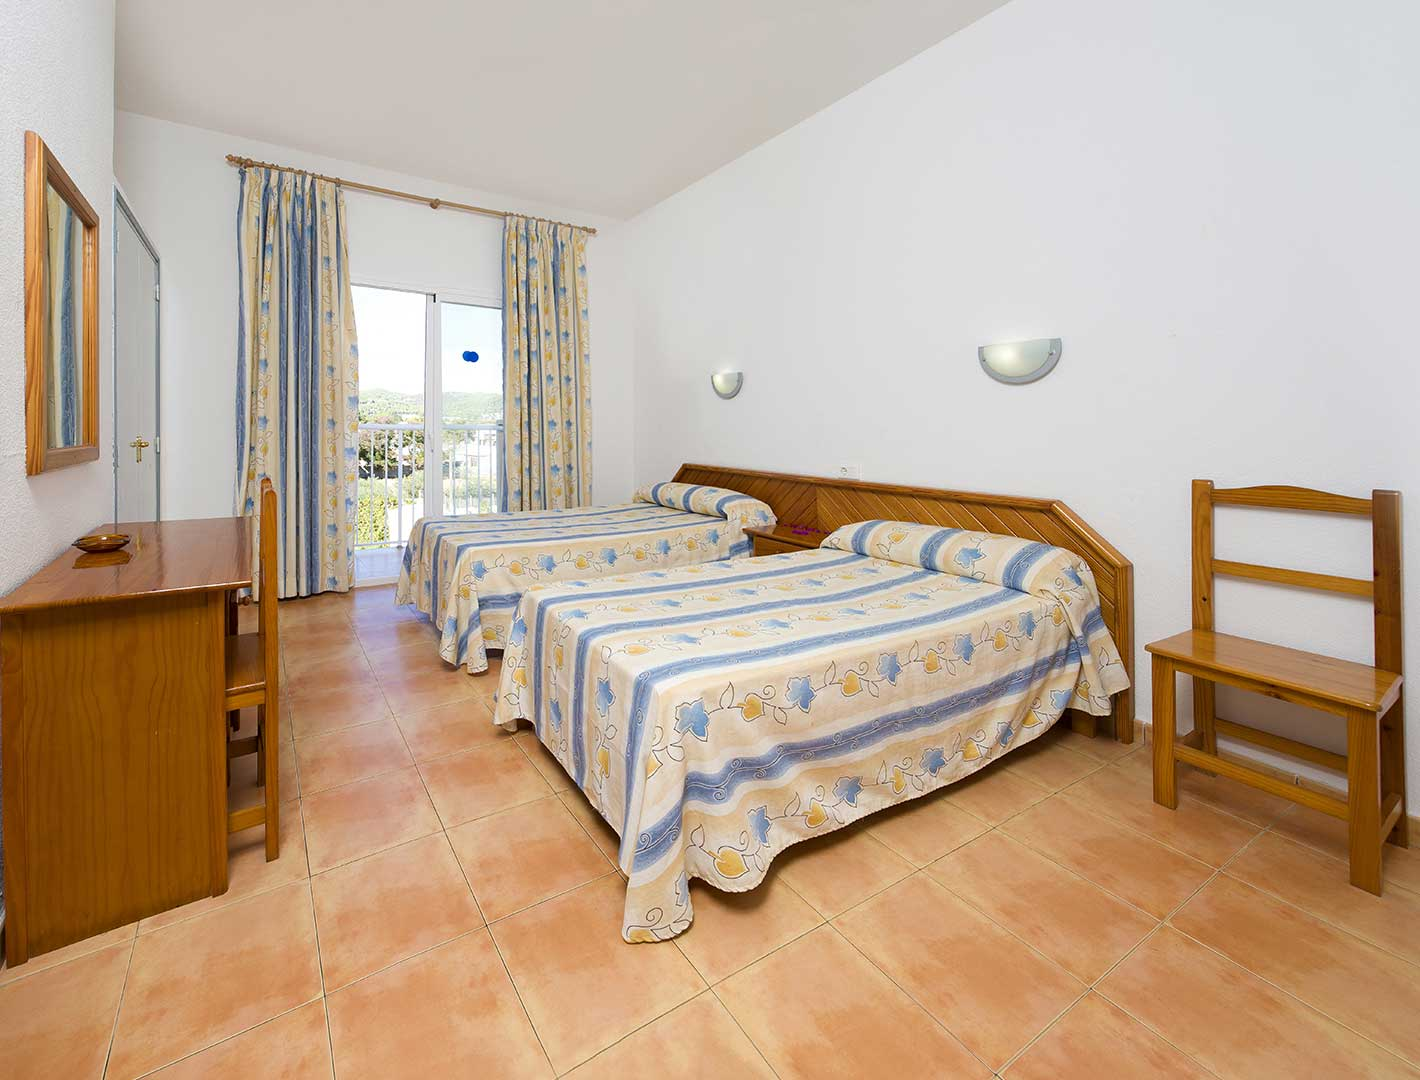 https://www.apartamentosbonsol-ibiza.com/wp-content/uploads/2020/02/doble-standard.jpg